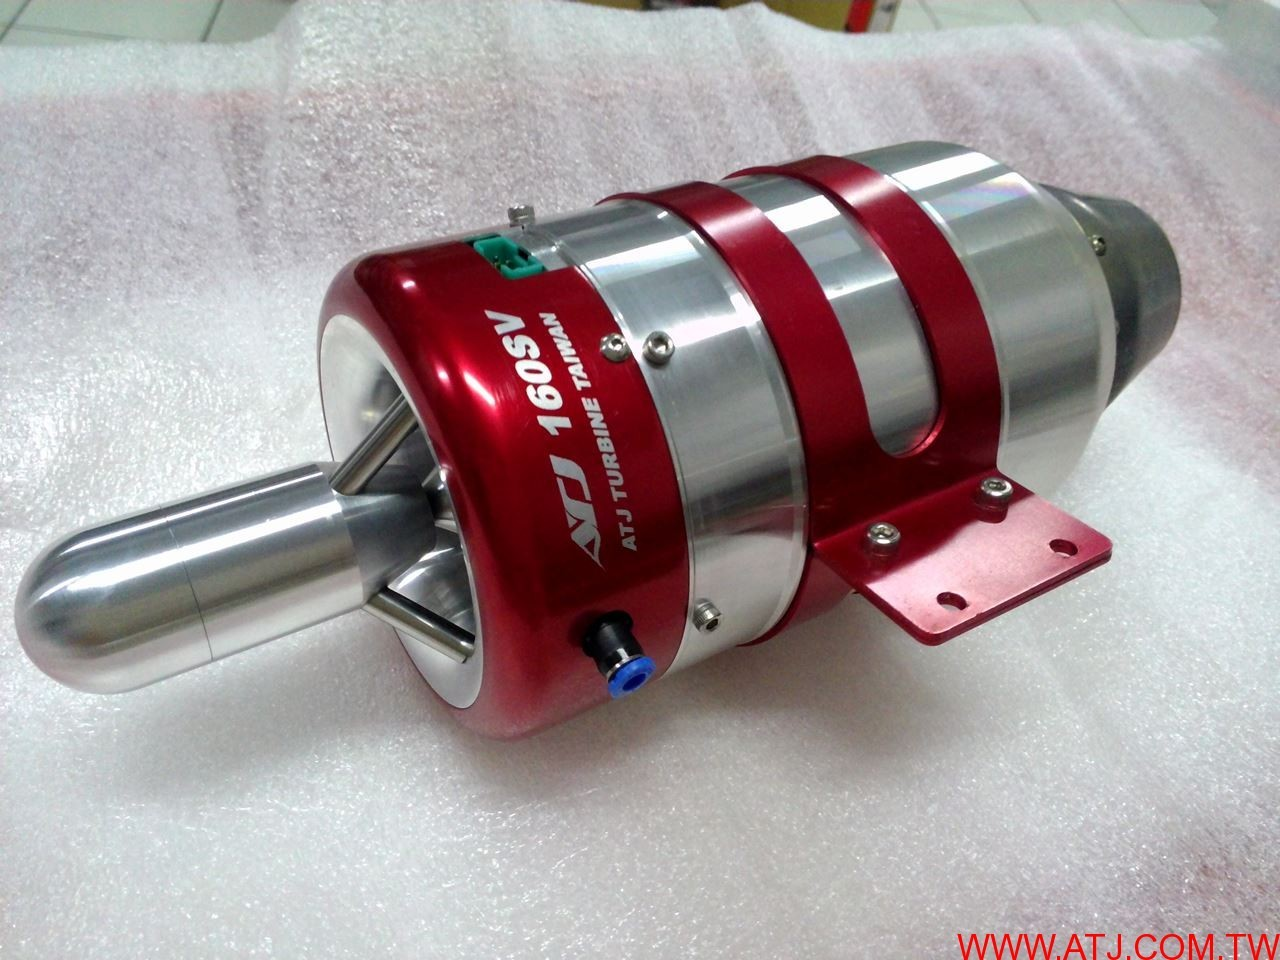 ATJ160SV, 16kg thrust turbine jet engine all new 2017 Version from ATJ  Turbines In stock Now